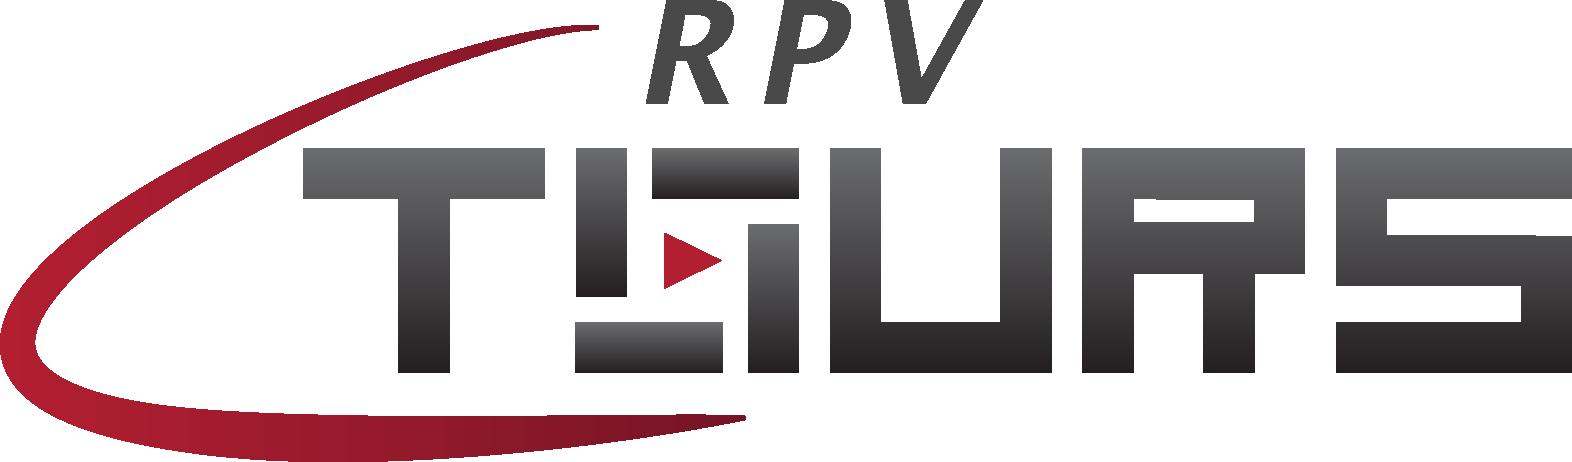 RPV Tours